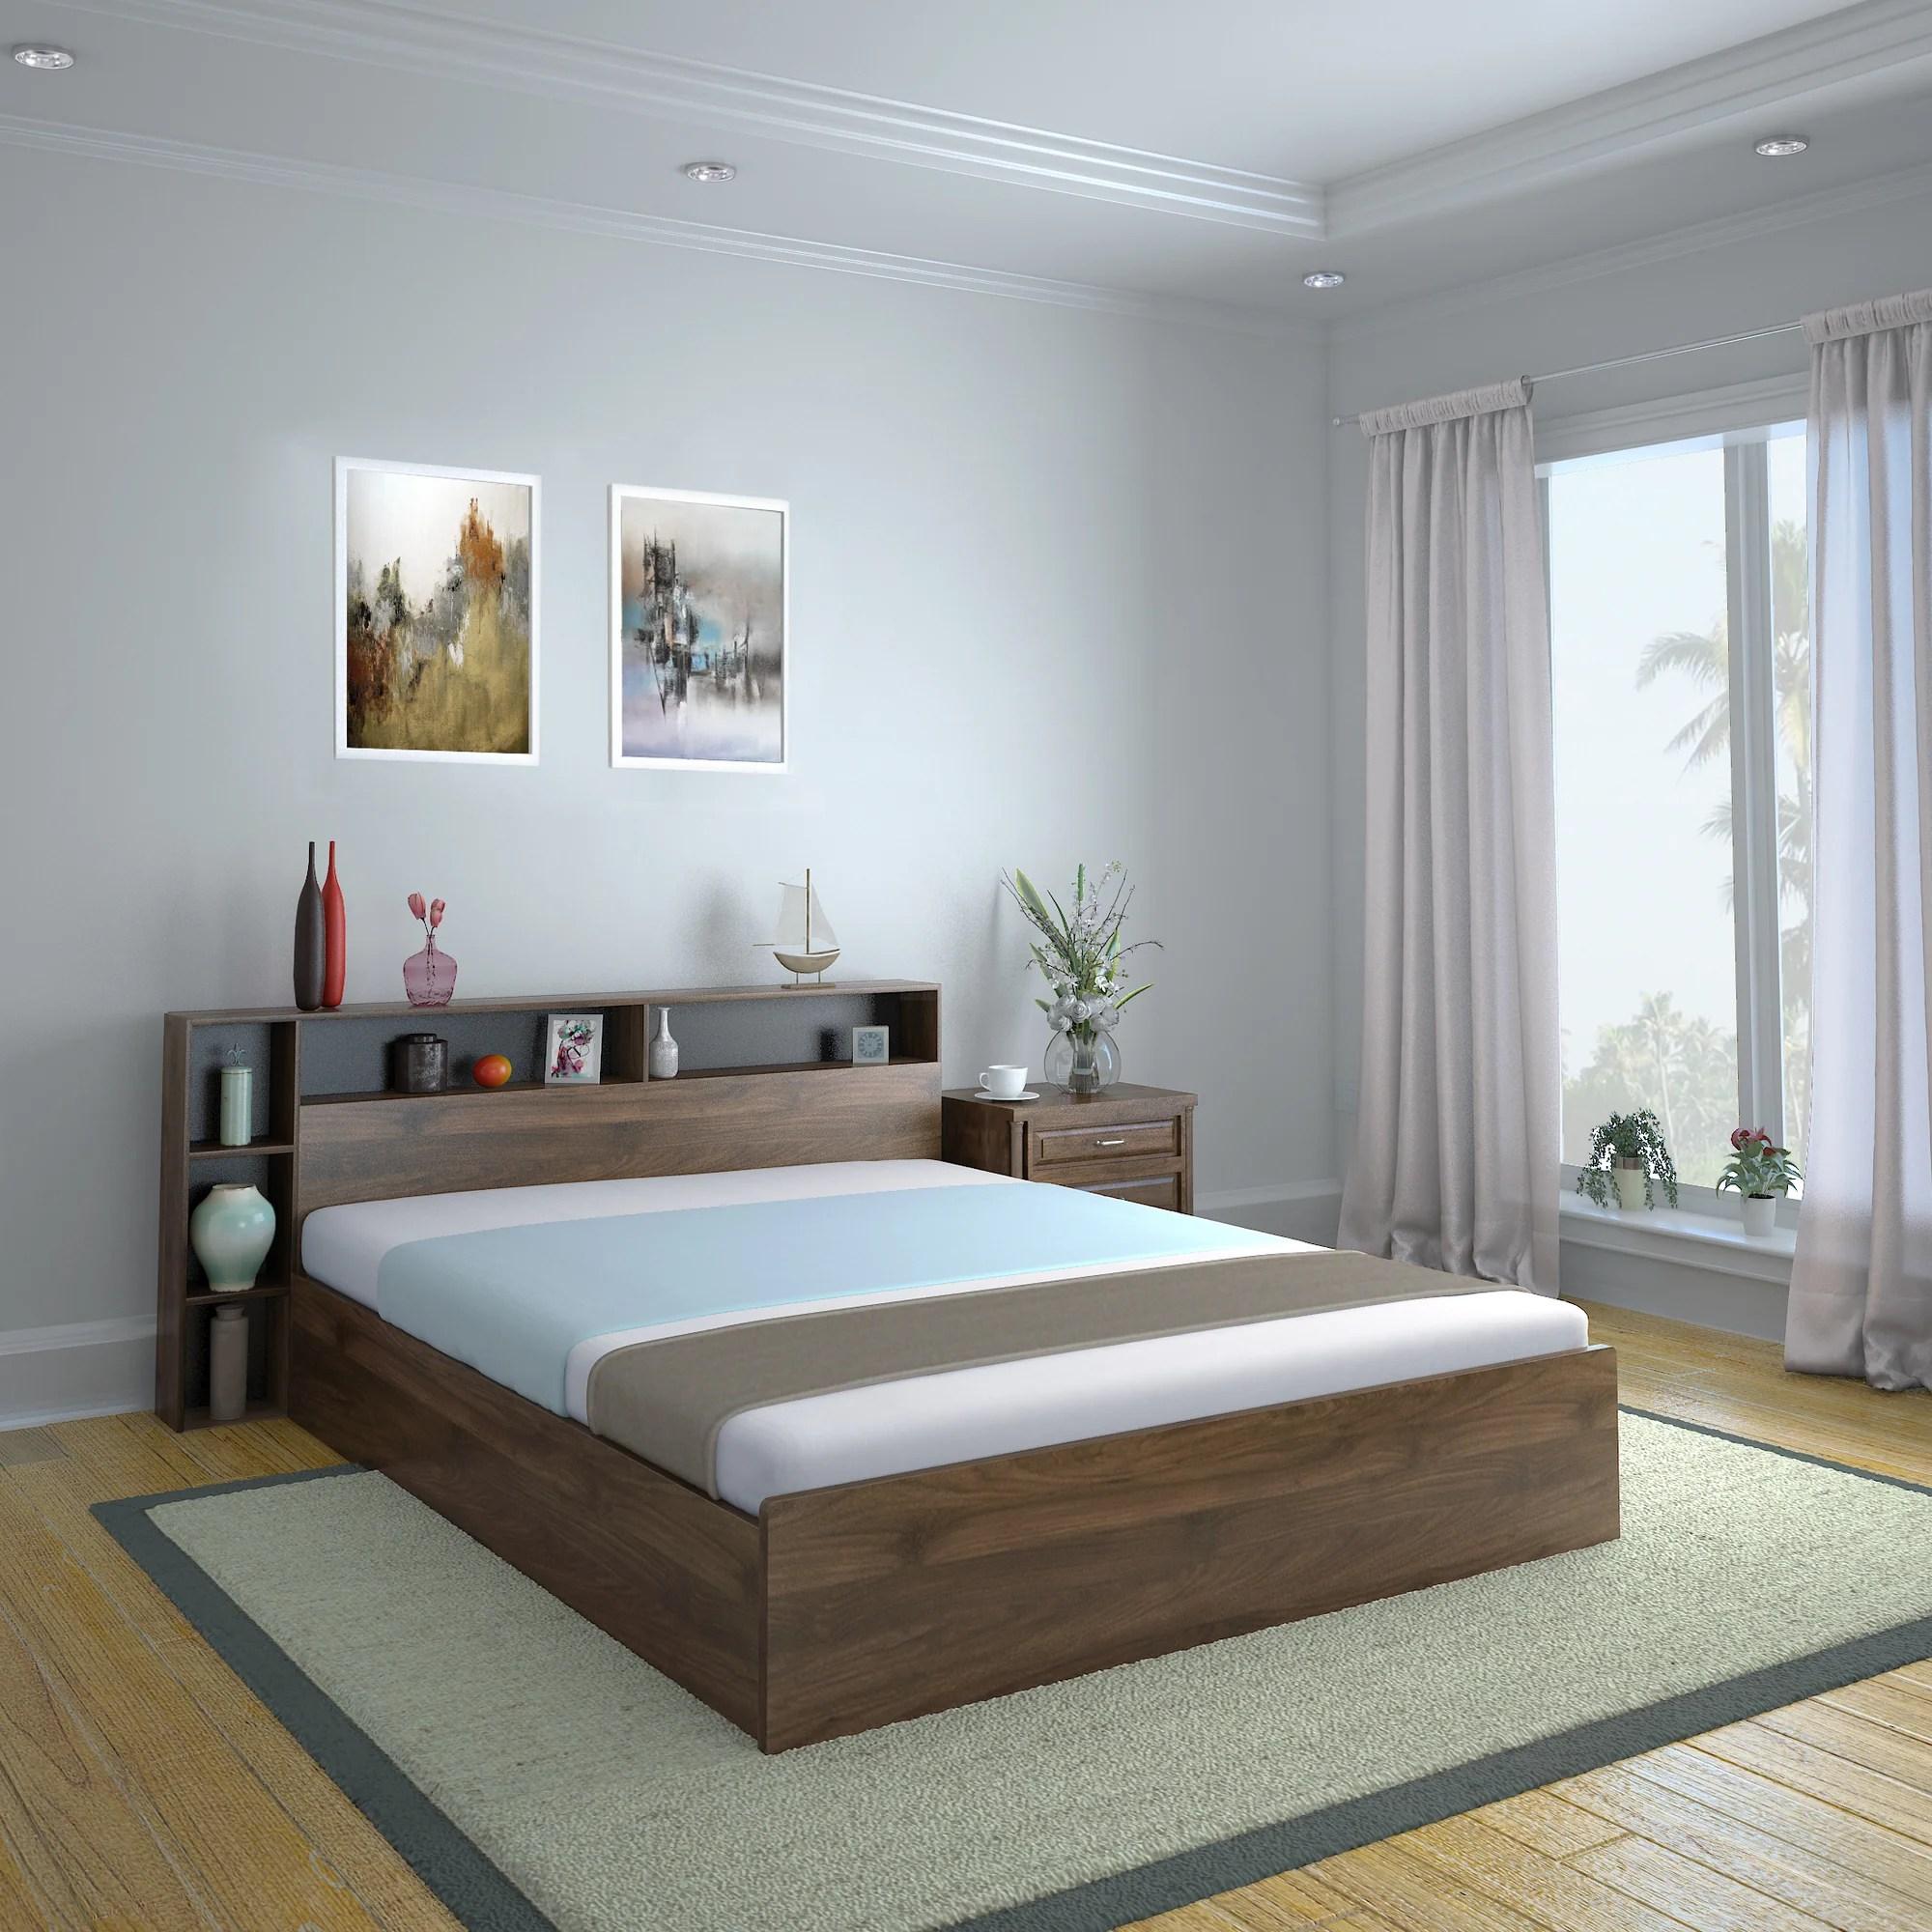 Torrie King Bed With Headboard Box Storage Black Nilkamal At Home Home